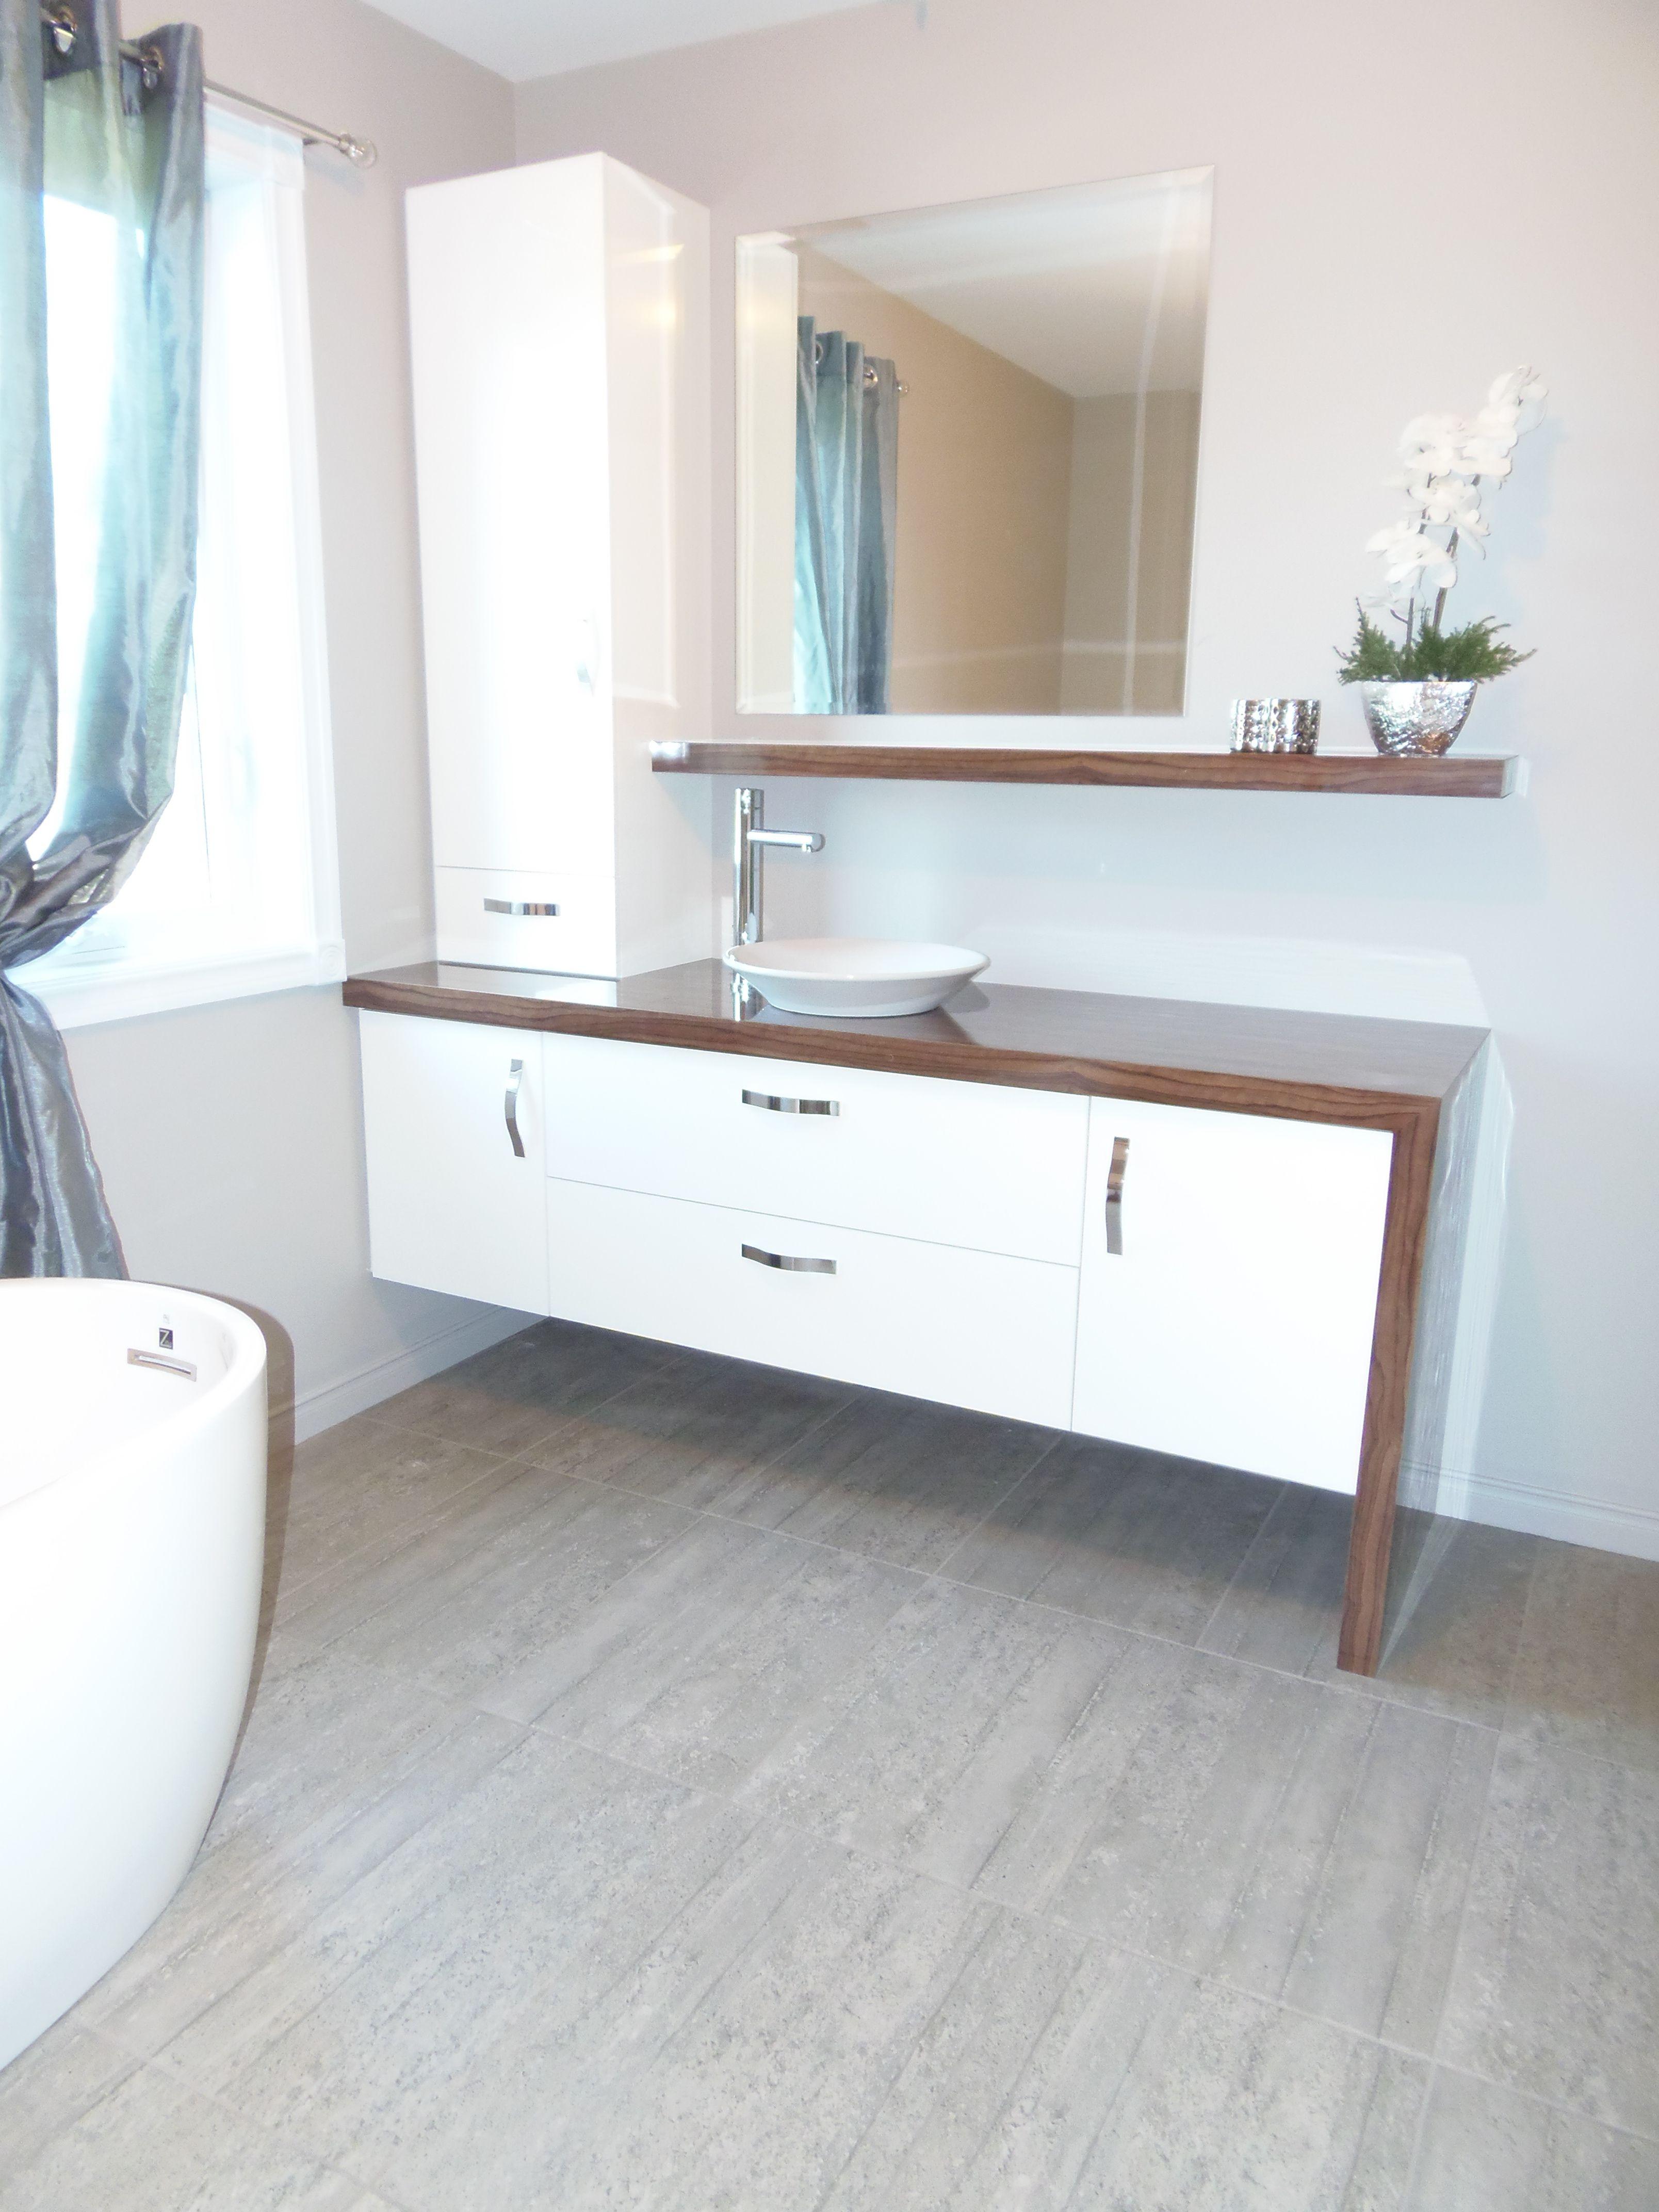 salle de bain moderne salle de bain pinterest small bathroom armoires and bath. Black Bedroom Furniture Sets. Home Design Ideas